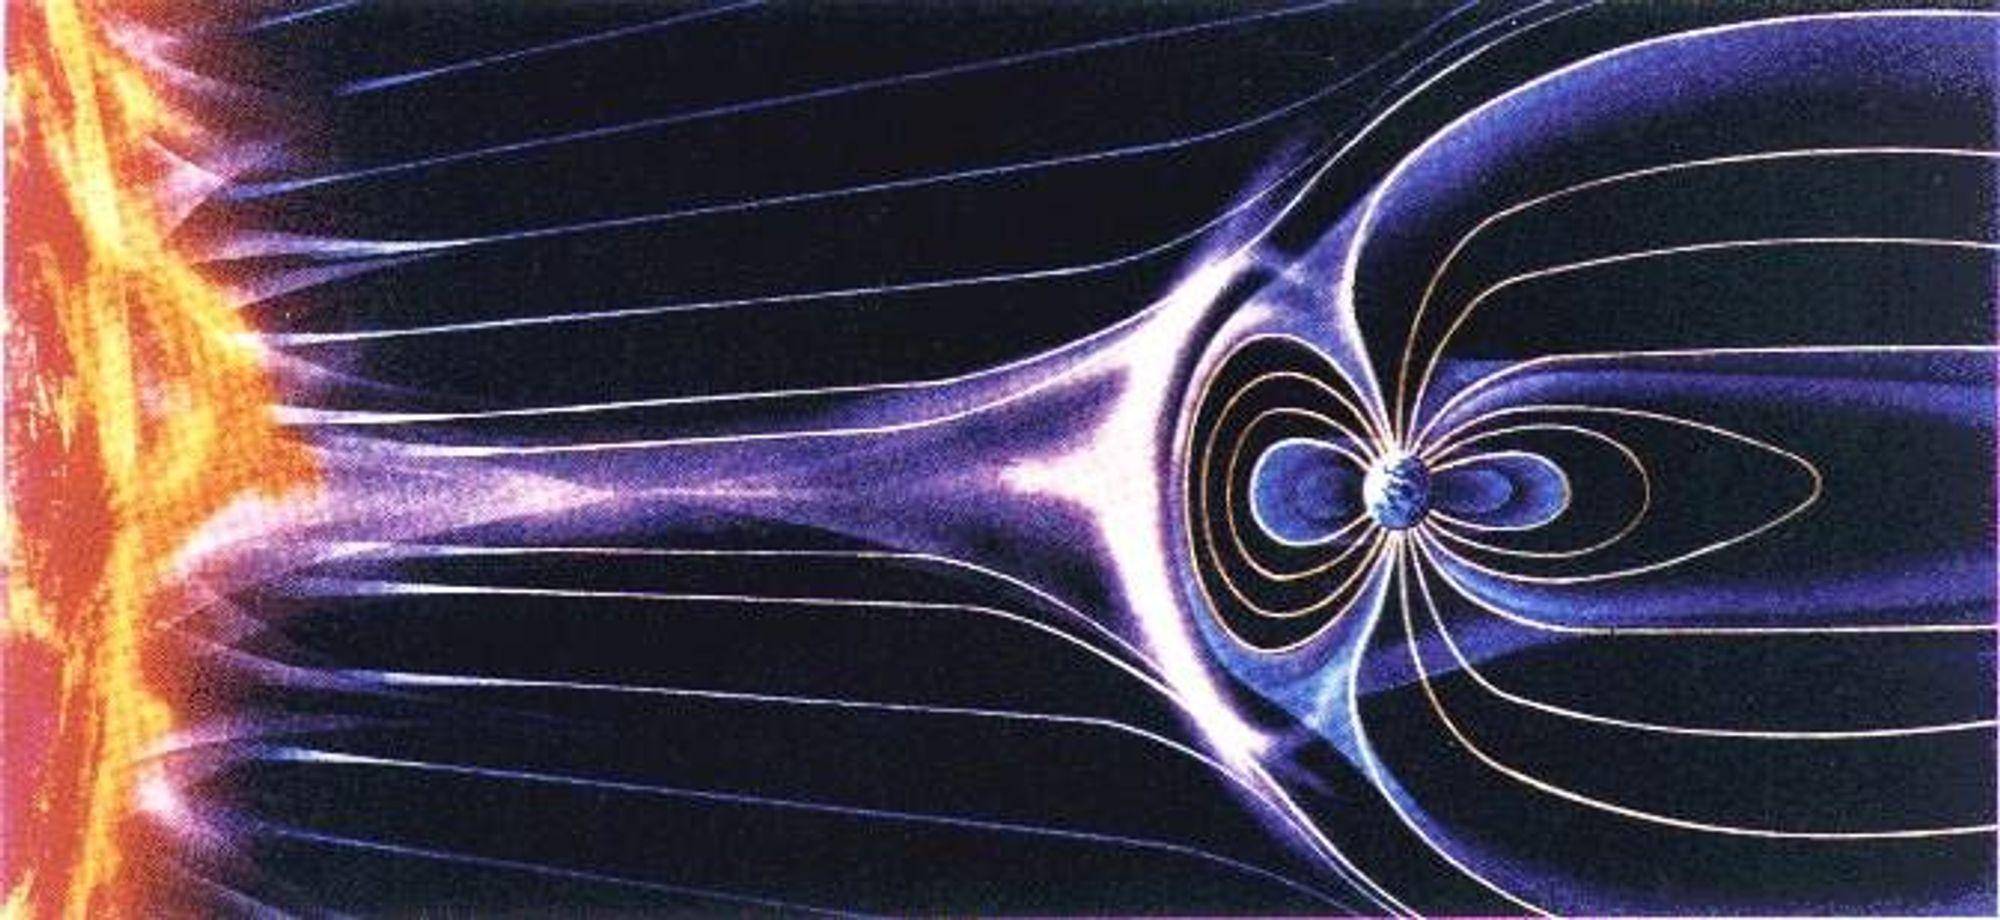 MagnetosphereWebPage_clip_image002.jpg